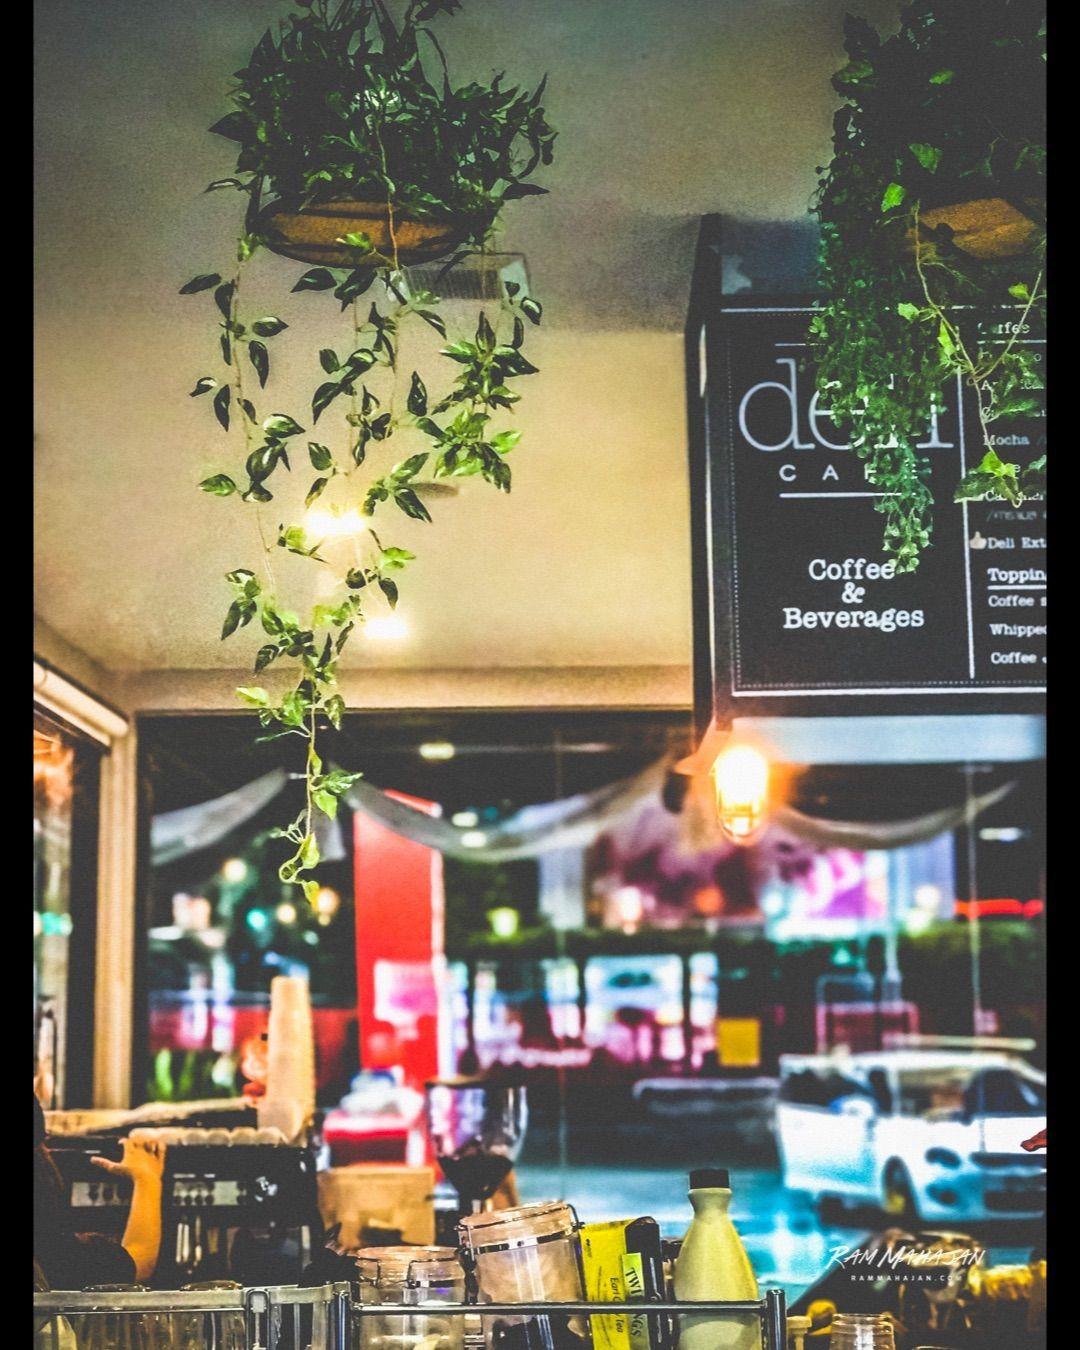 bokeh cafe coffee everyday iPhone lights#bokeh #cafe #coffee #everyday #iPhone #lights